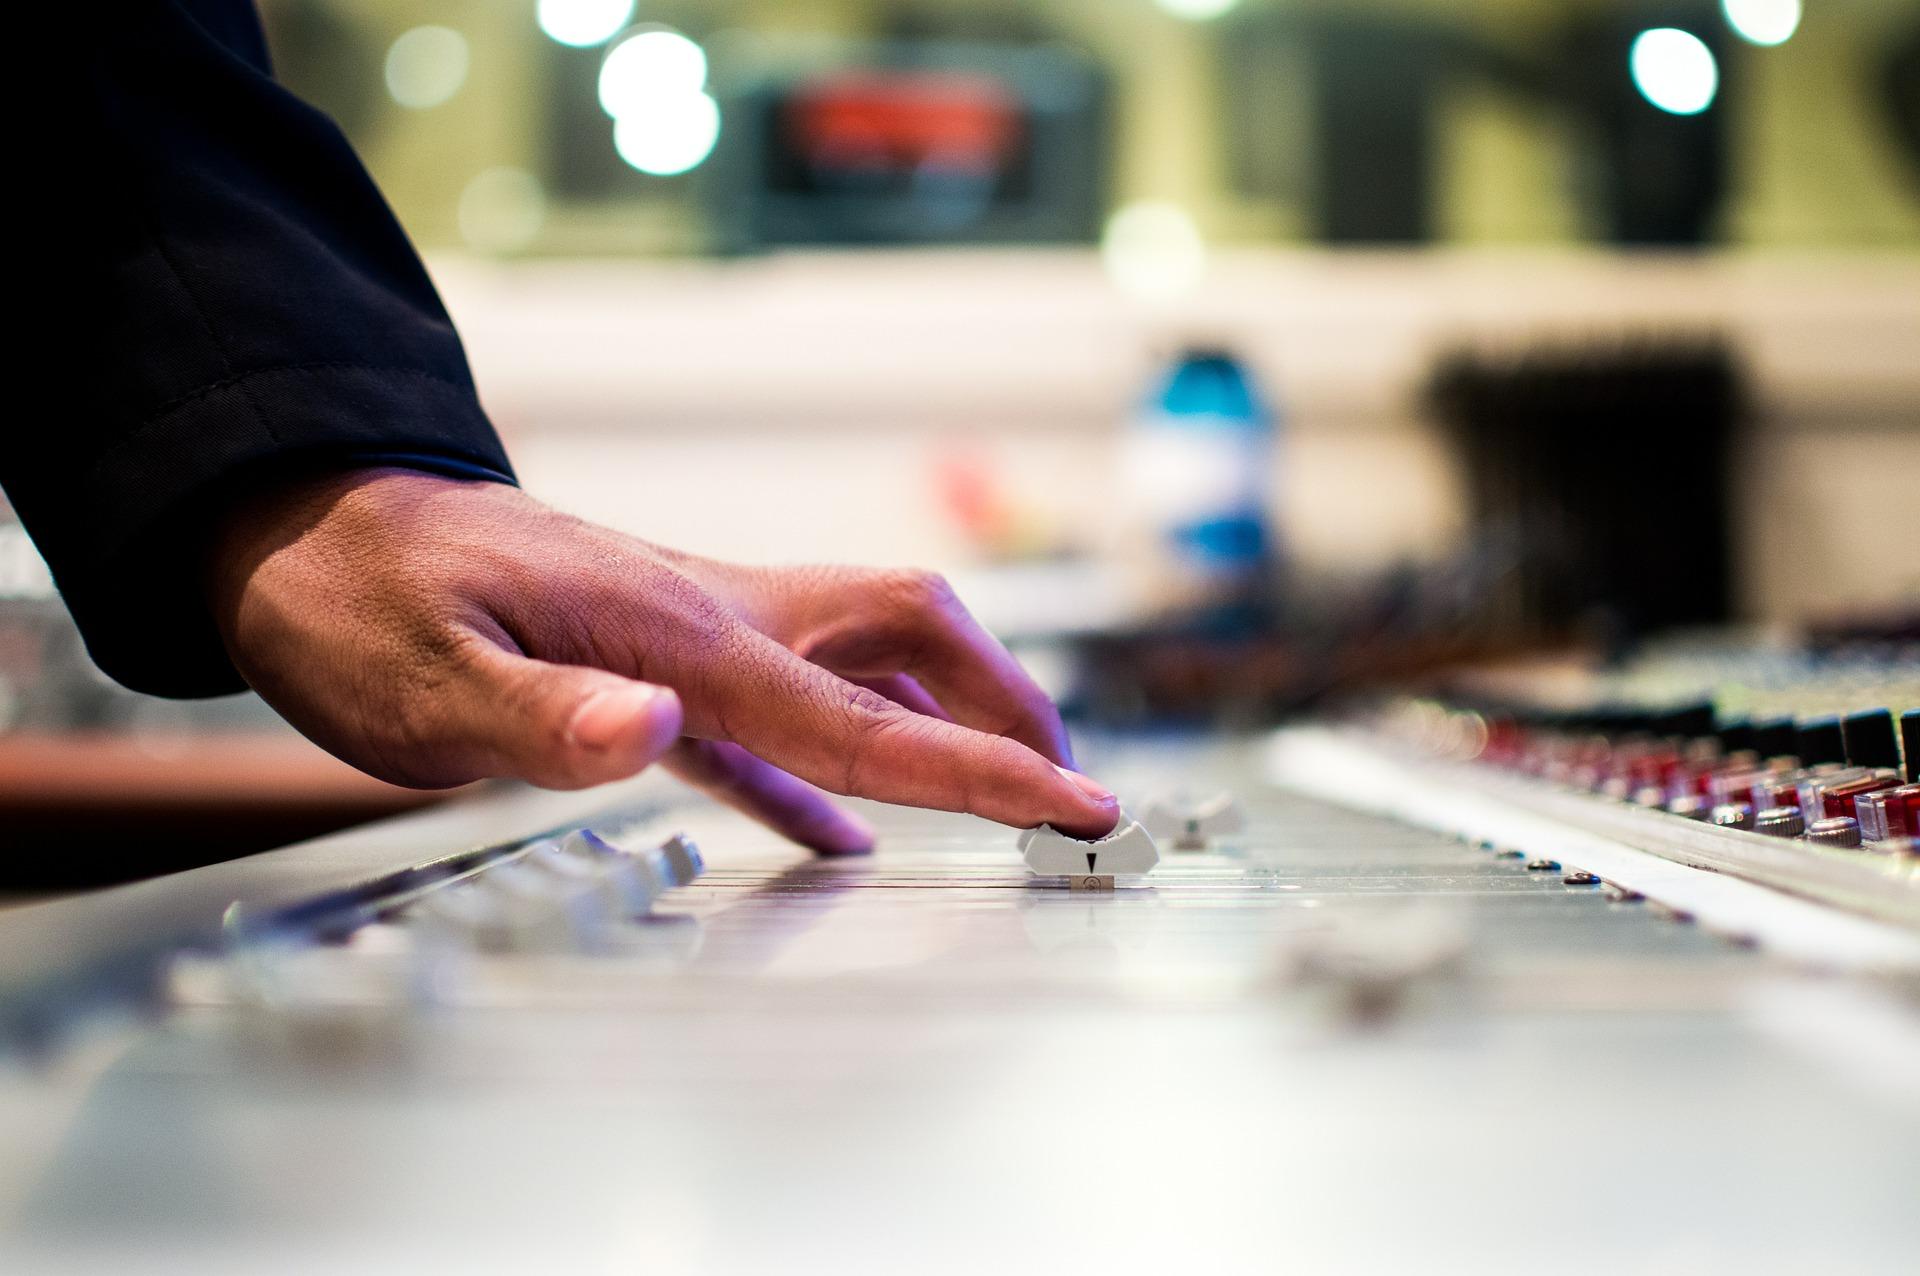 Music NFT Platform OneOf Raises $63M